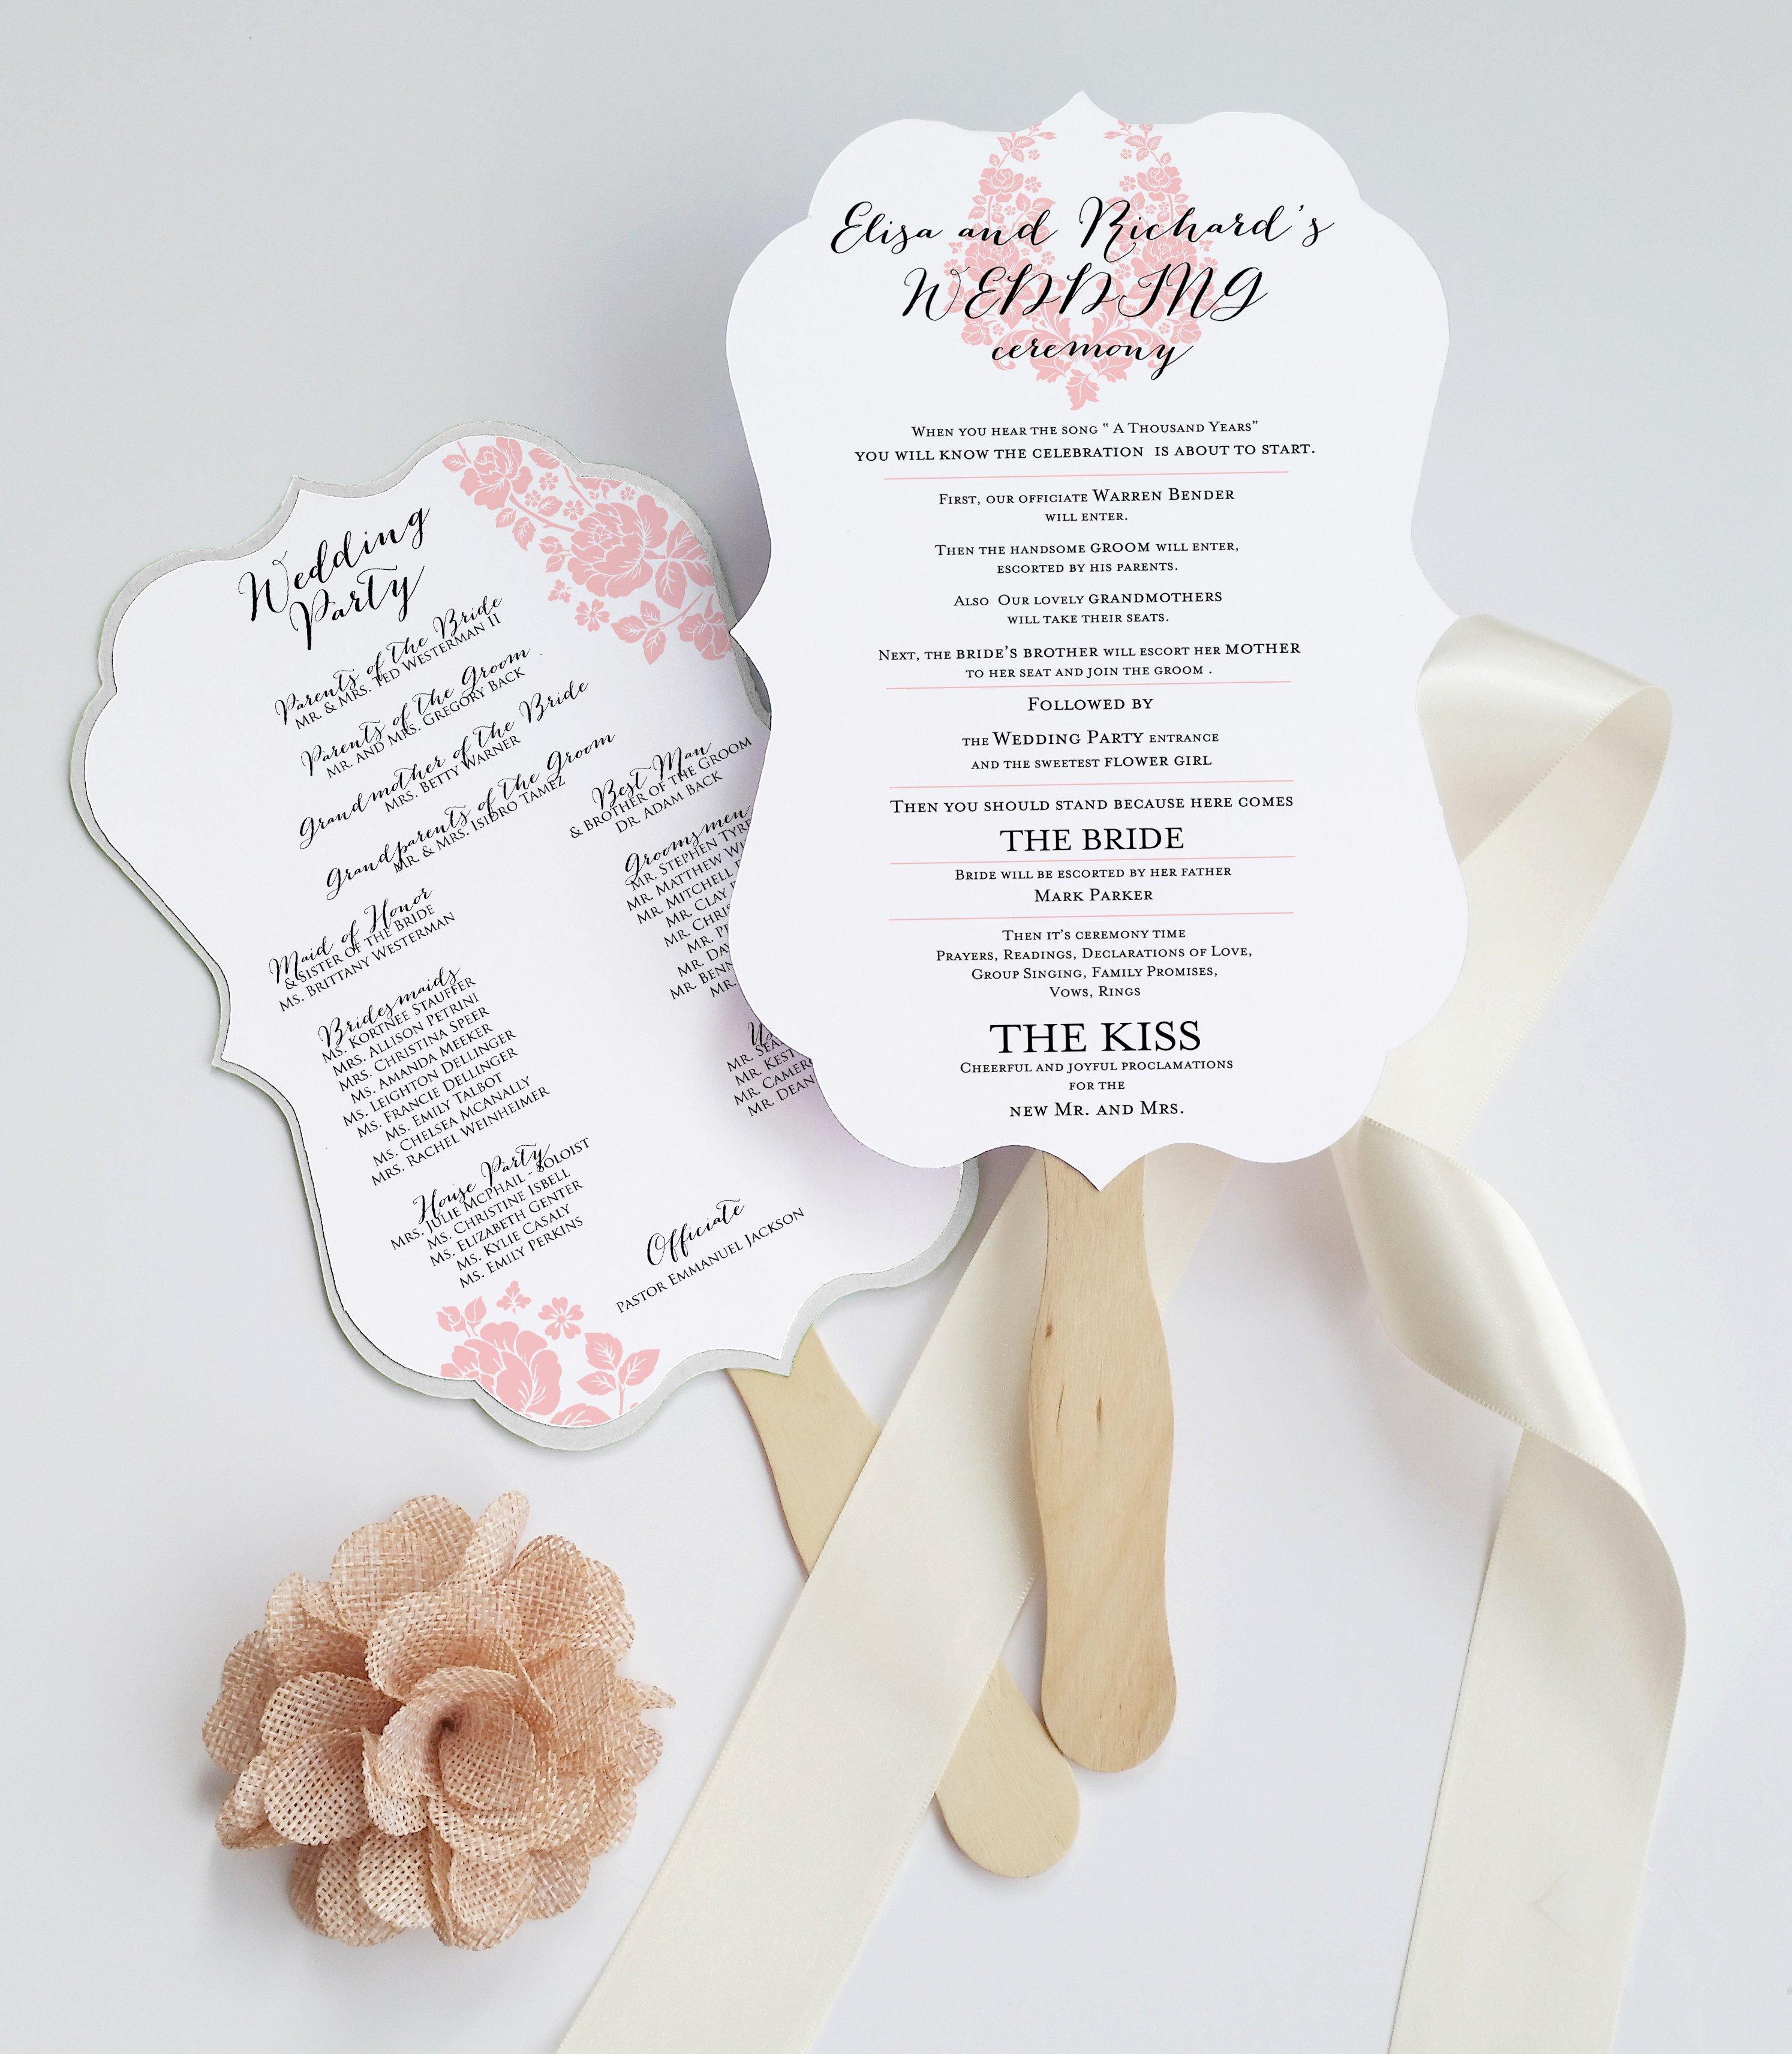 Deersfield Wedding Program Fan Cut and Coordinates